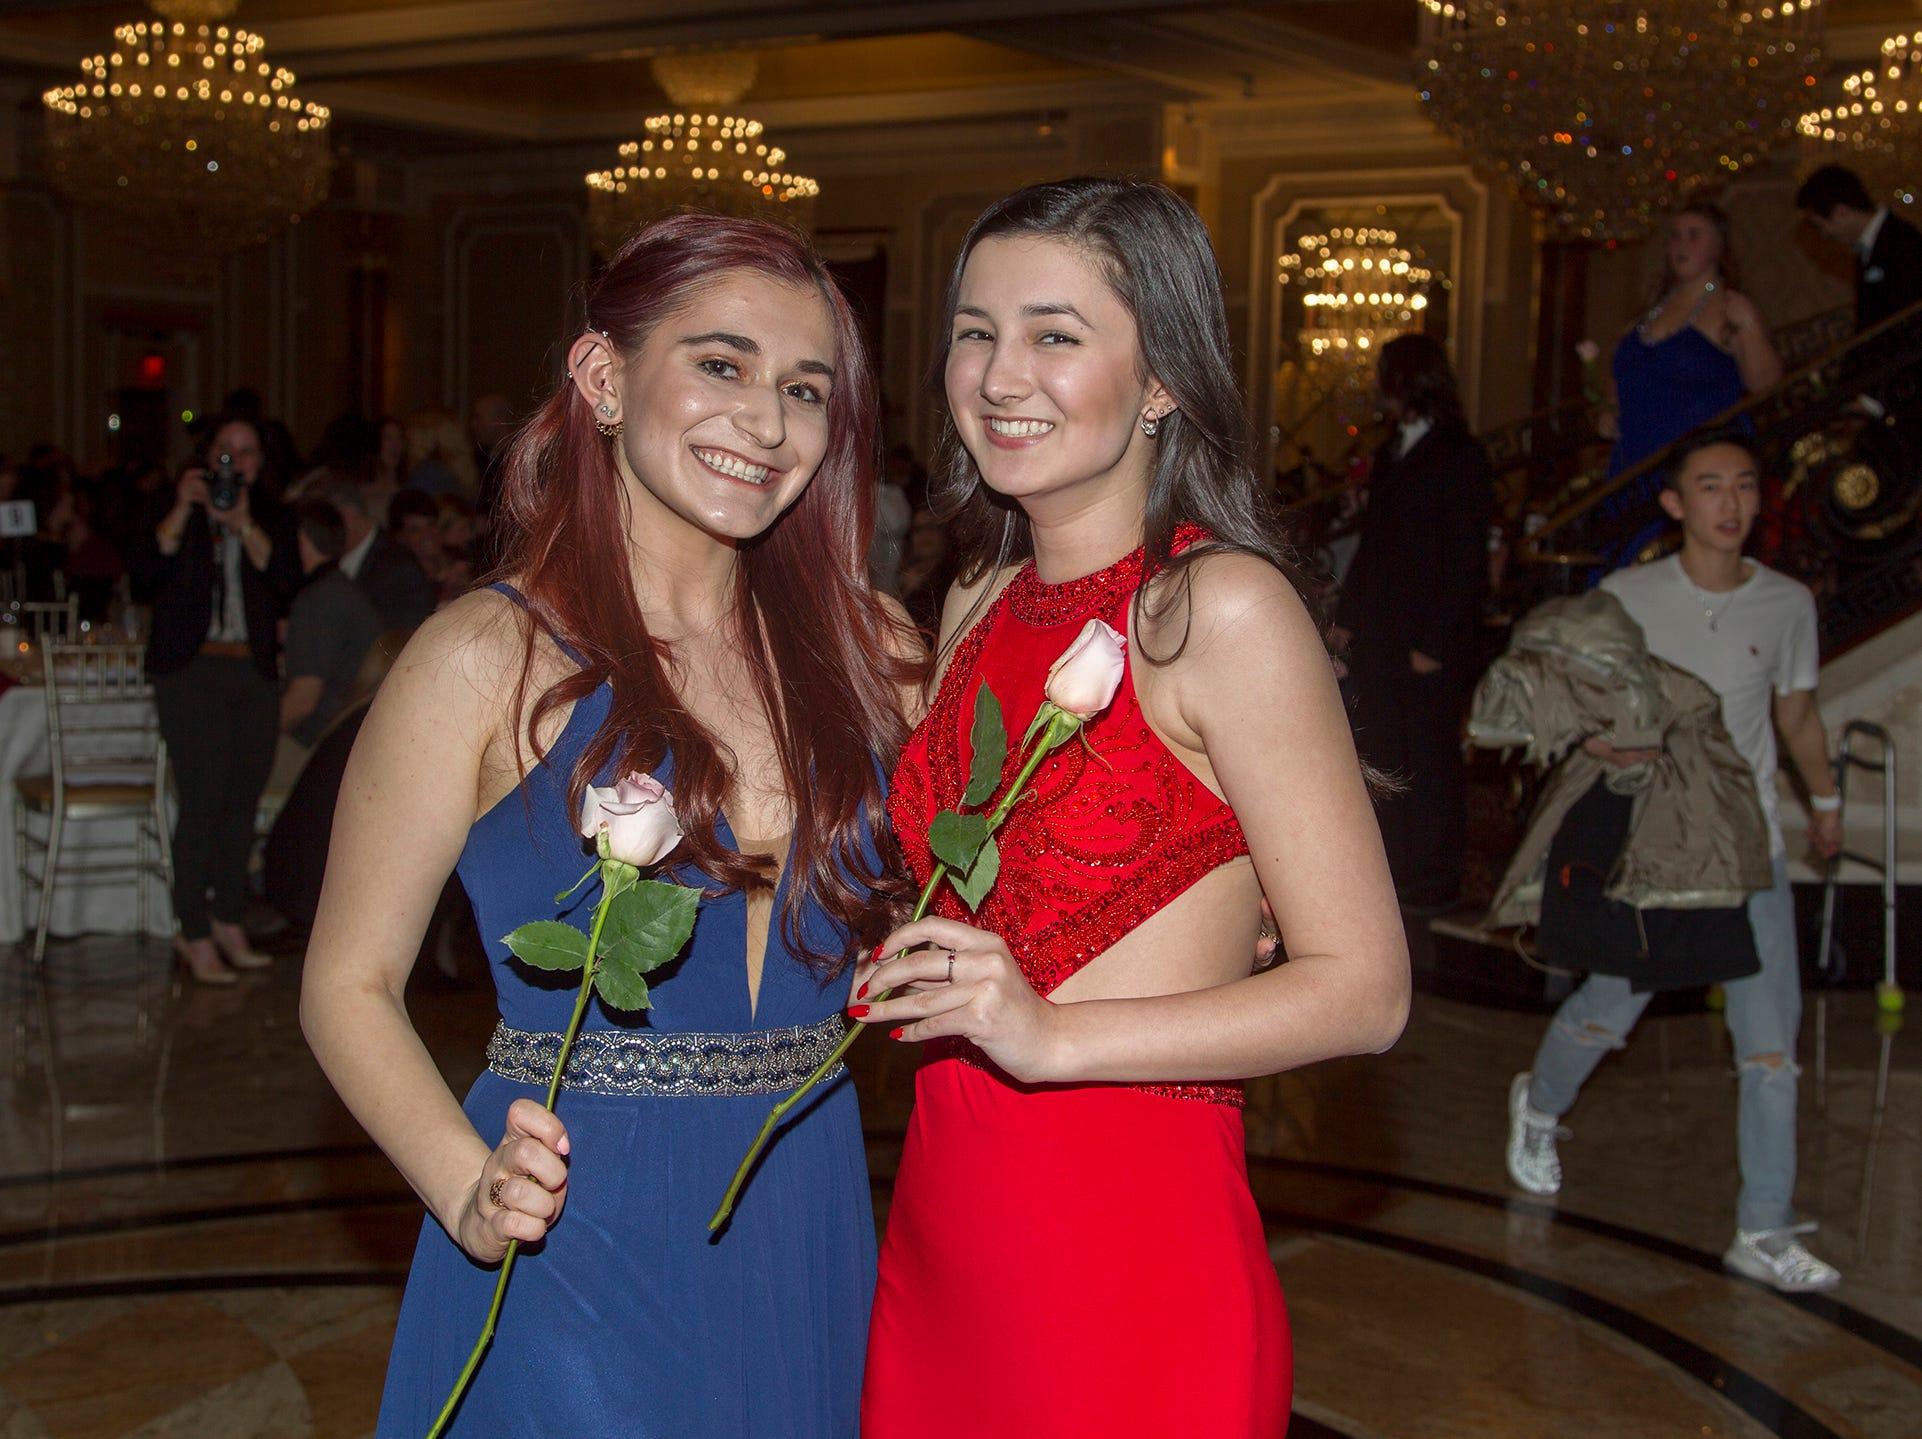 Wayne Hills High School held its Project Graduation Fashion Show at Venetian in Garfield. 03/05/2019